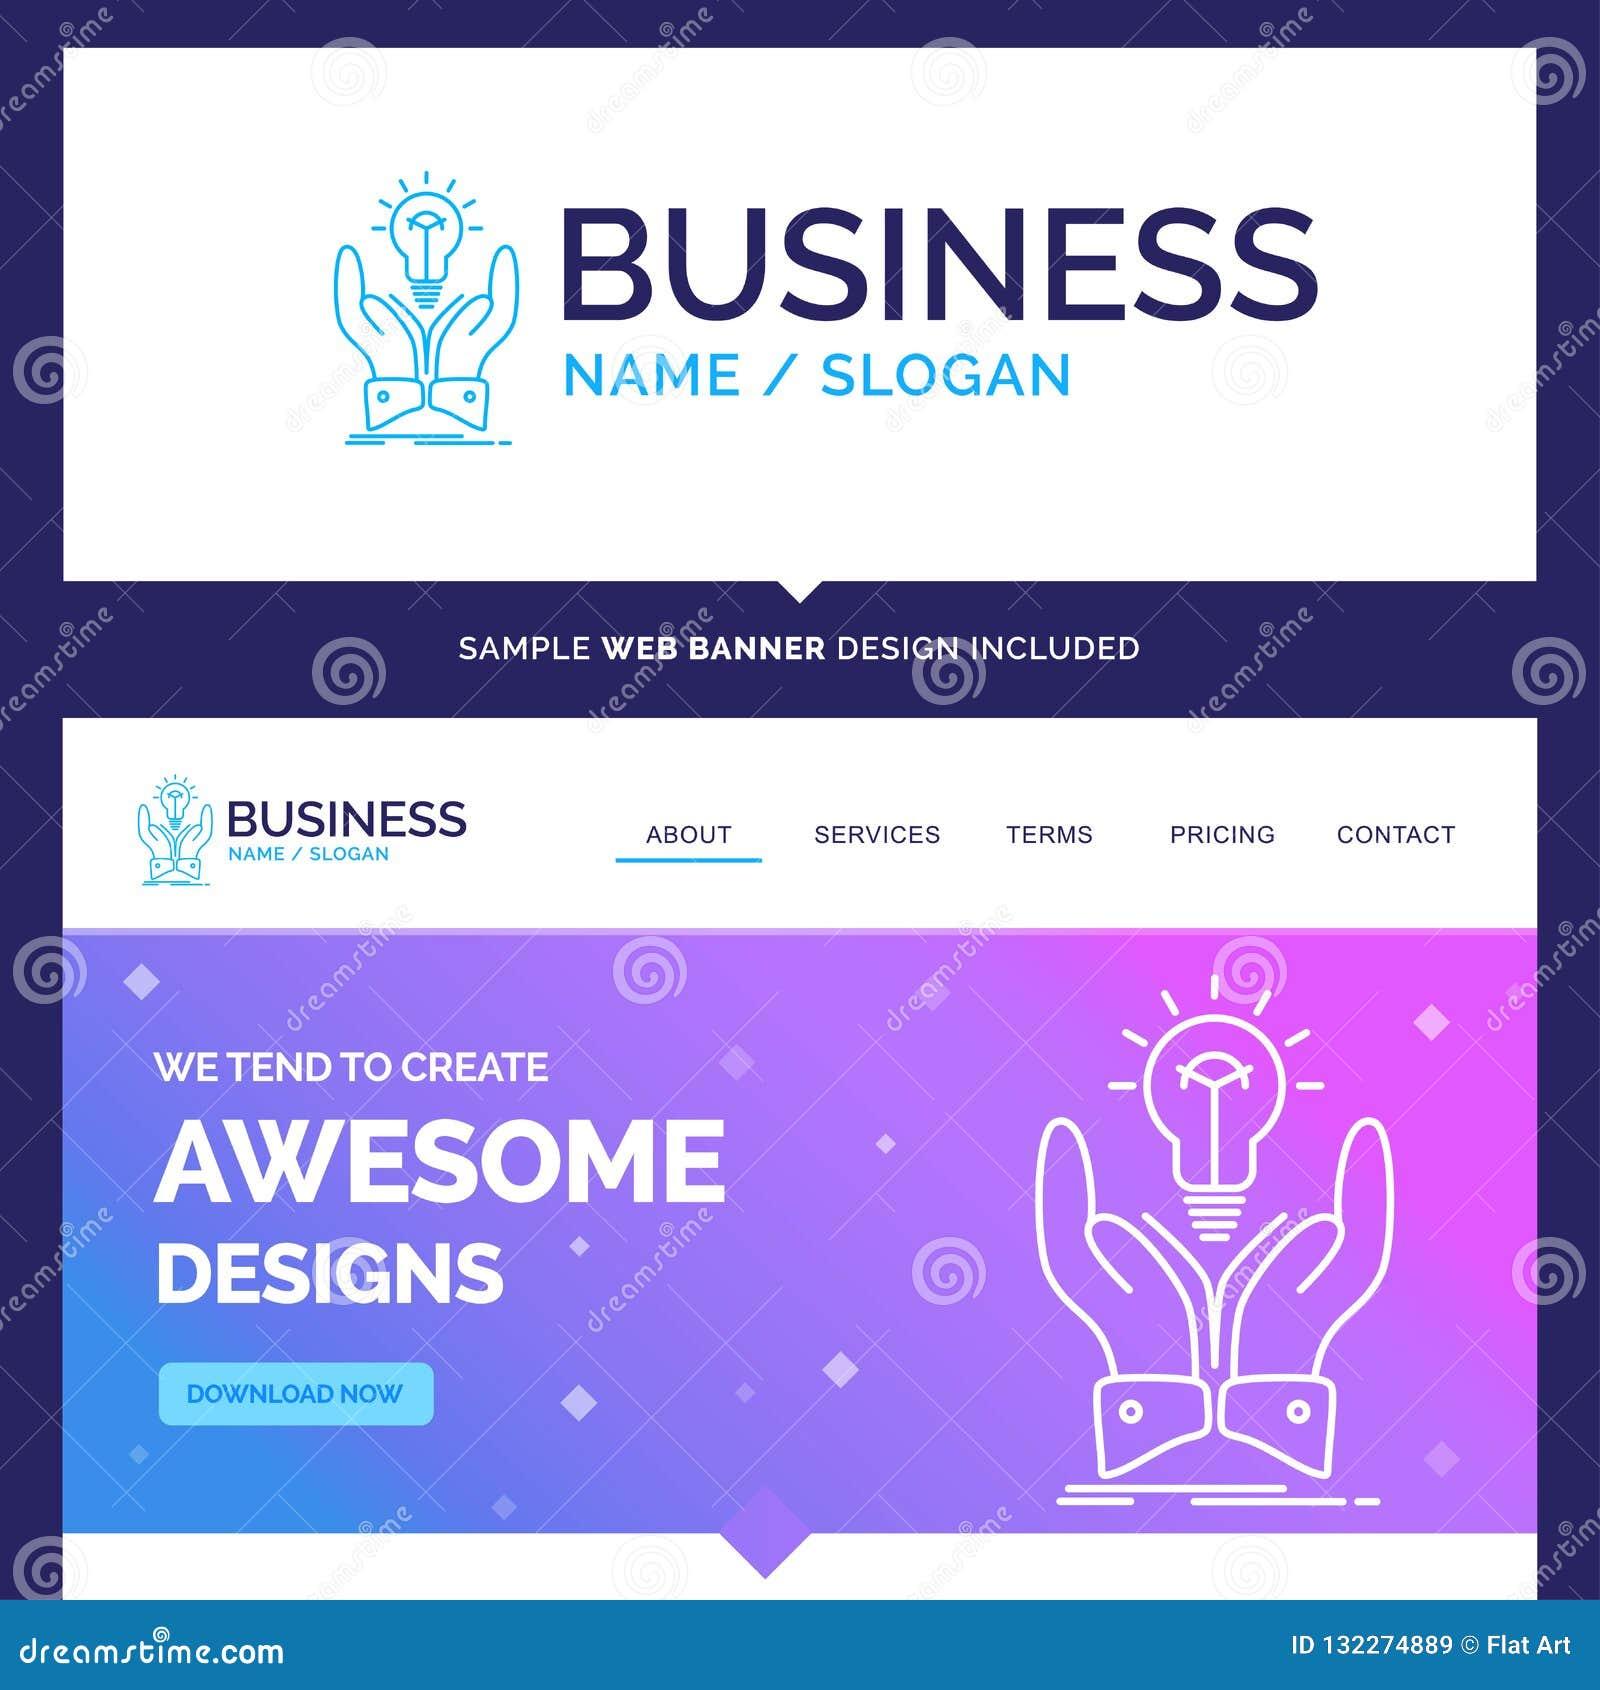 Beautiful Business Concept Brand Name Idea, Ideas, Creative ...